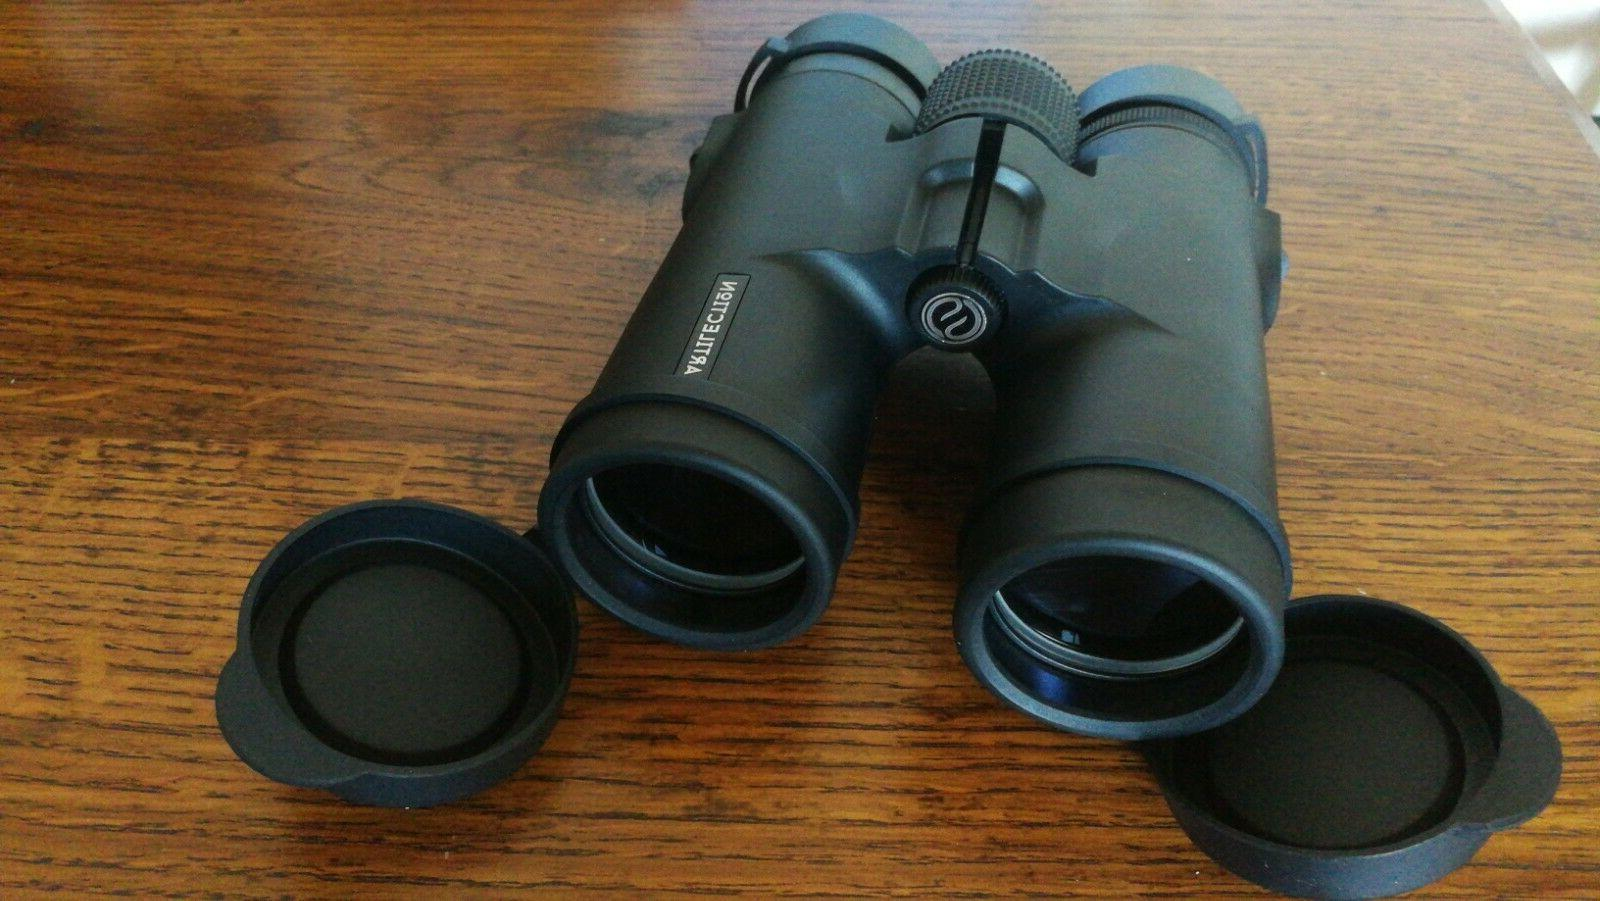 10x42 binoculars for adults hd professional high